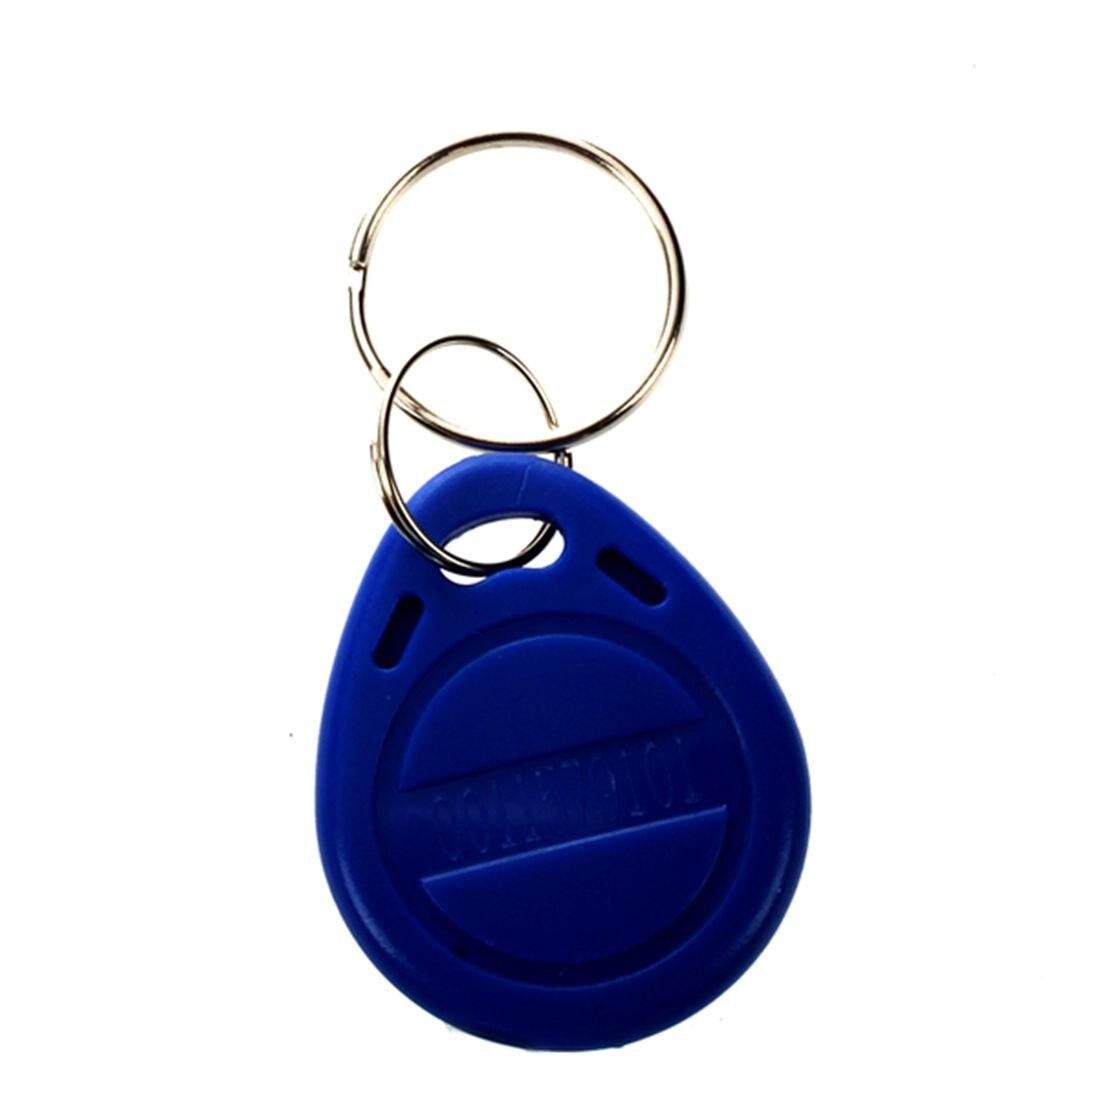 10pcs 125khz RFID Proximity ID Token Key Tag Keychain Waterproof New turck proximity switch bi2 g12sk an6x